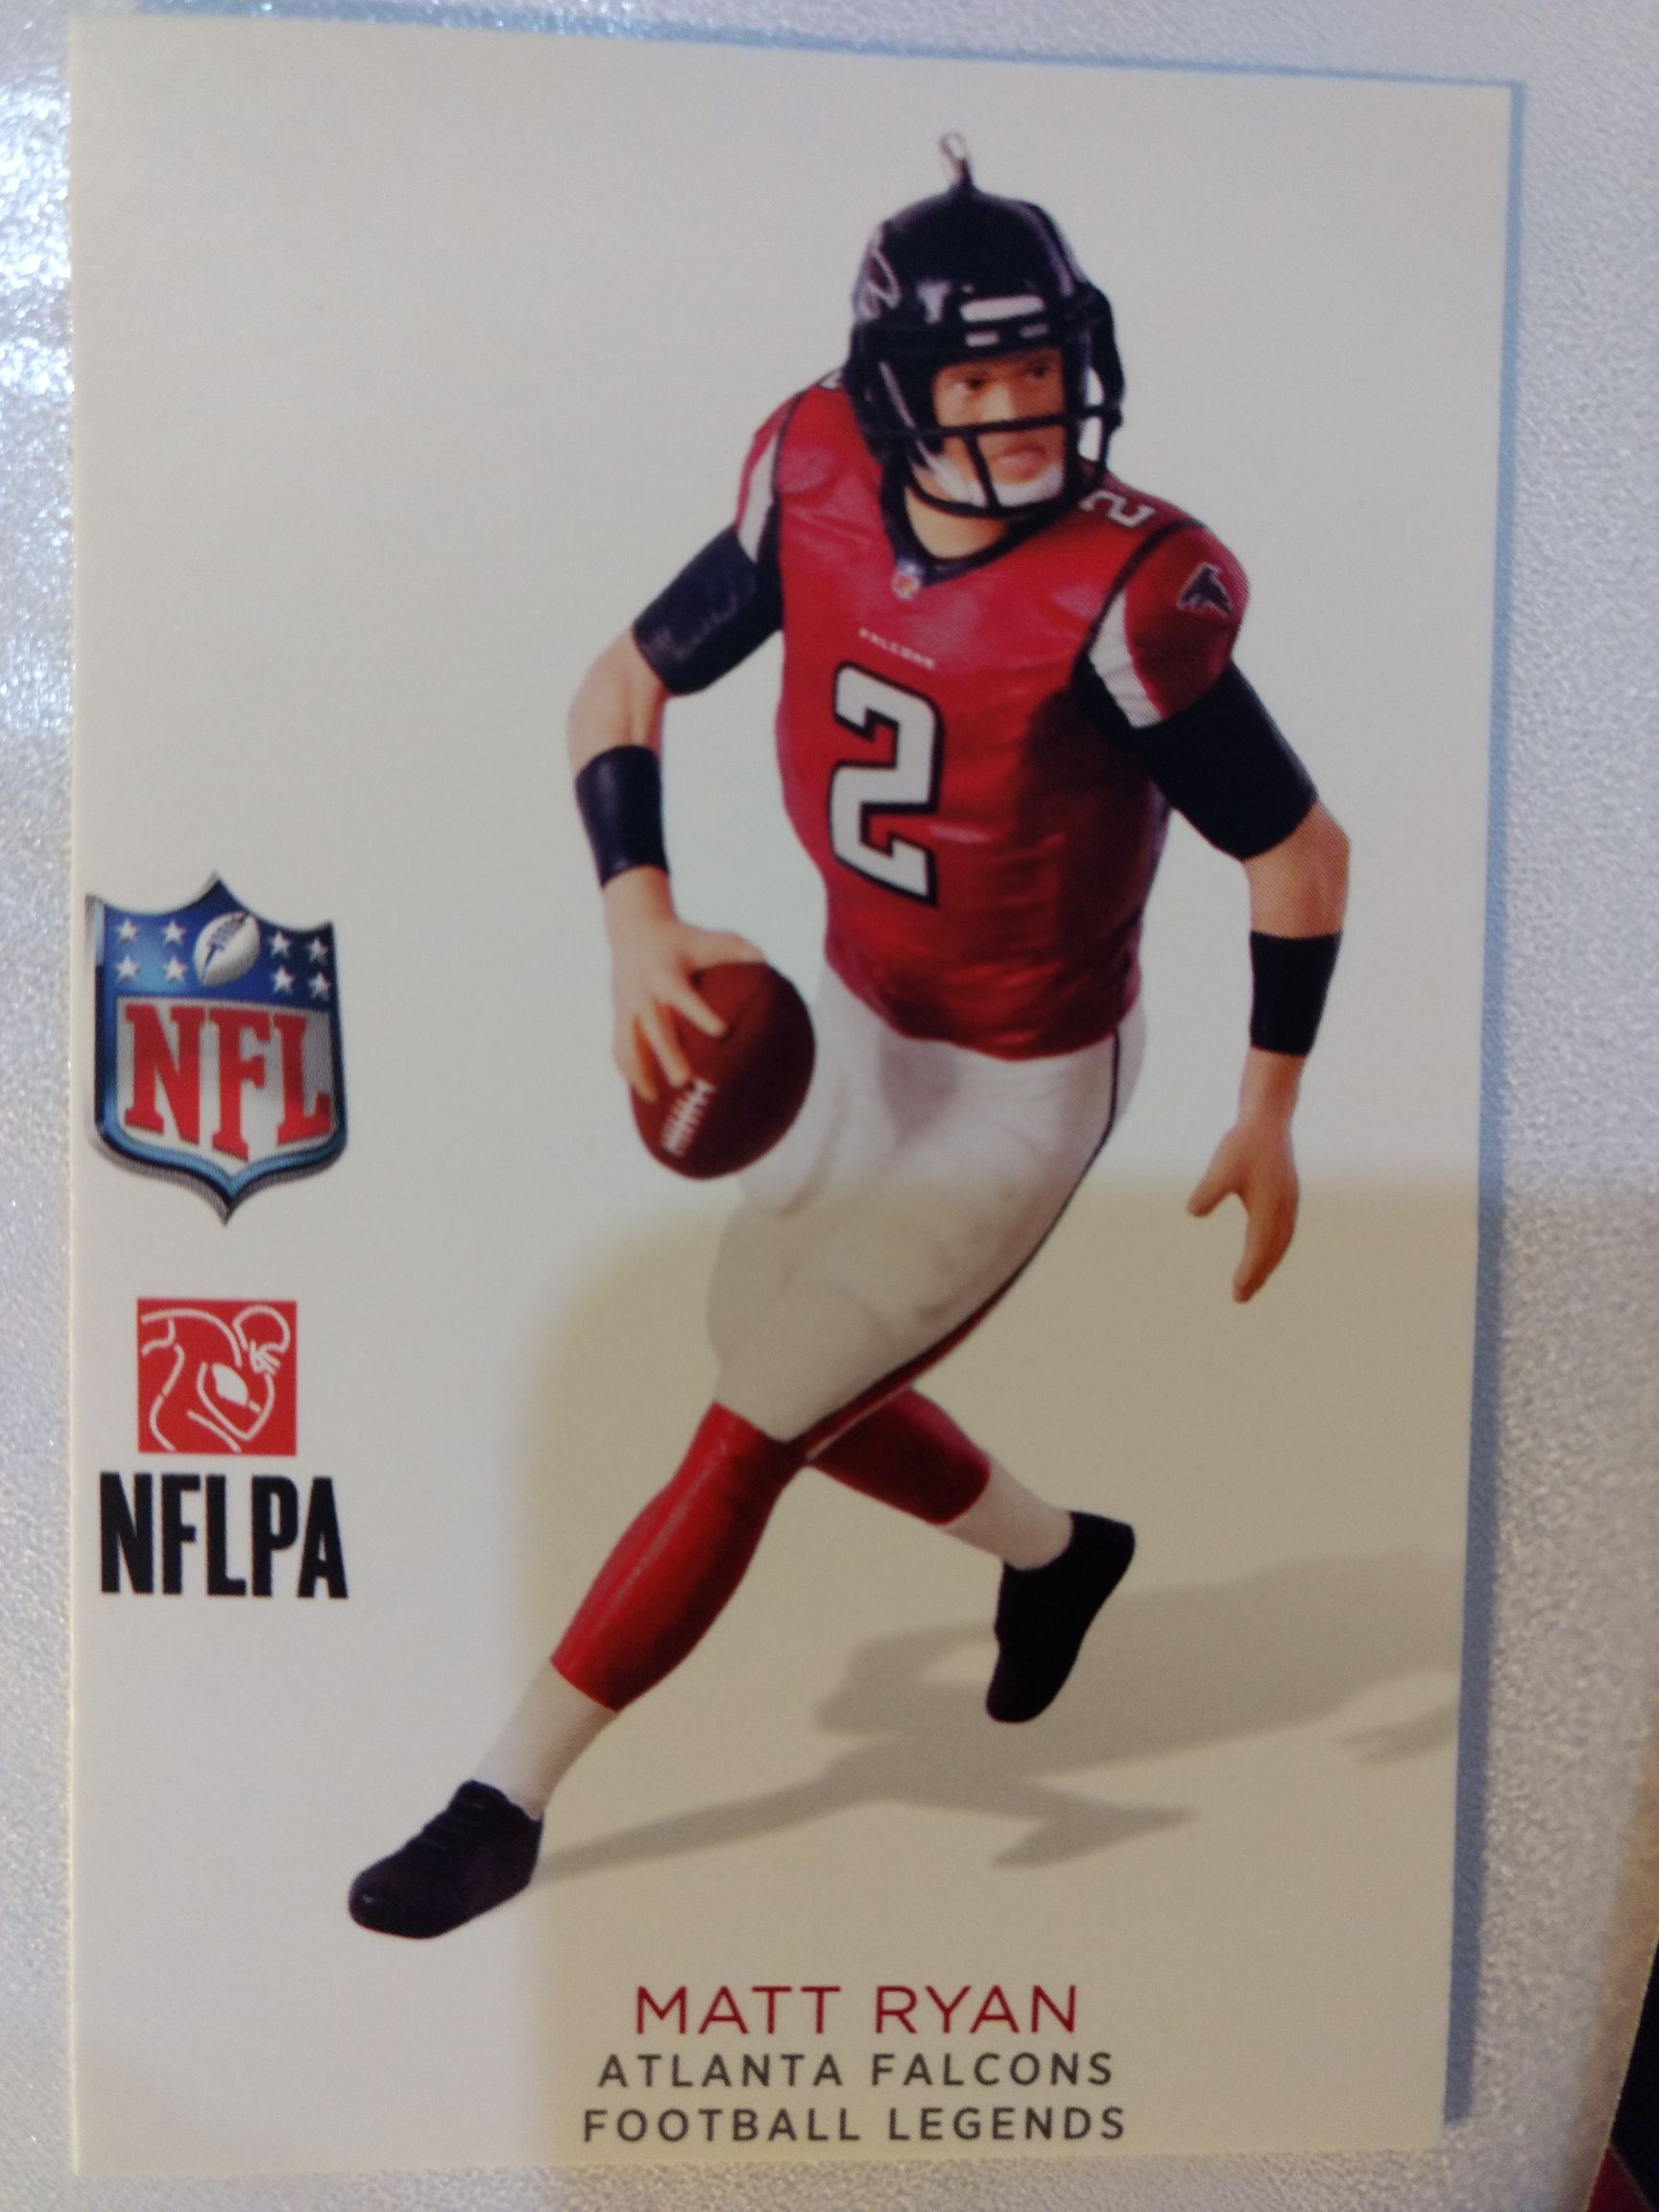 Aports - Football - Matt Ryan Ornament - Hallmark front image (front cover)